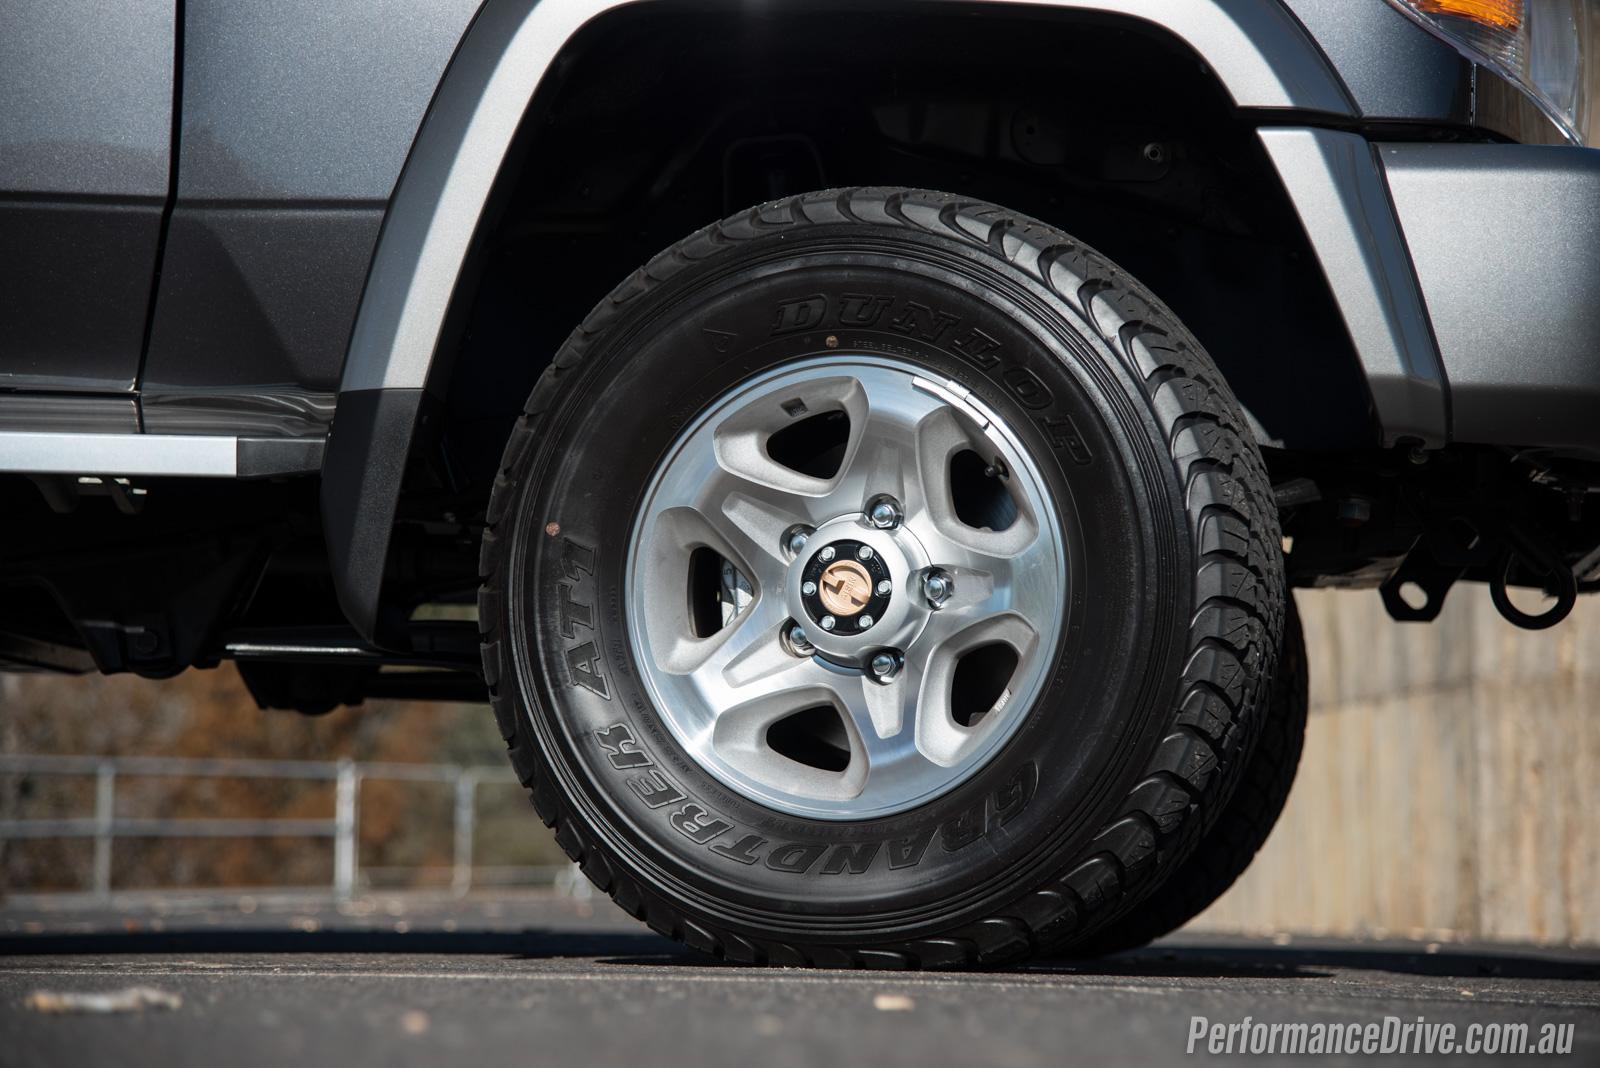 2016 Toyota Landcruiser 70 Ute Review Video